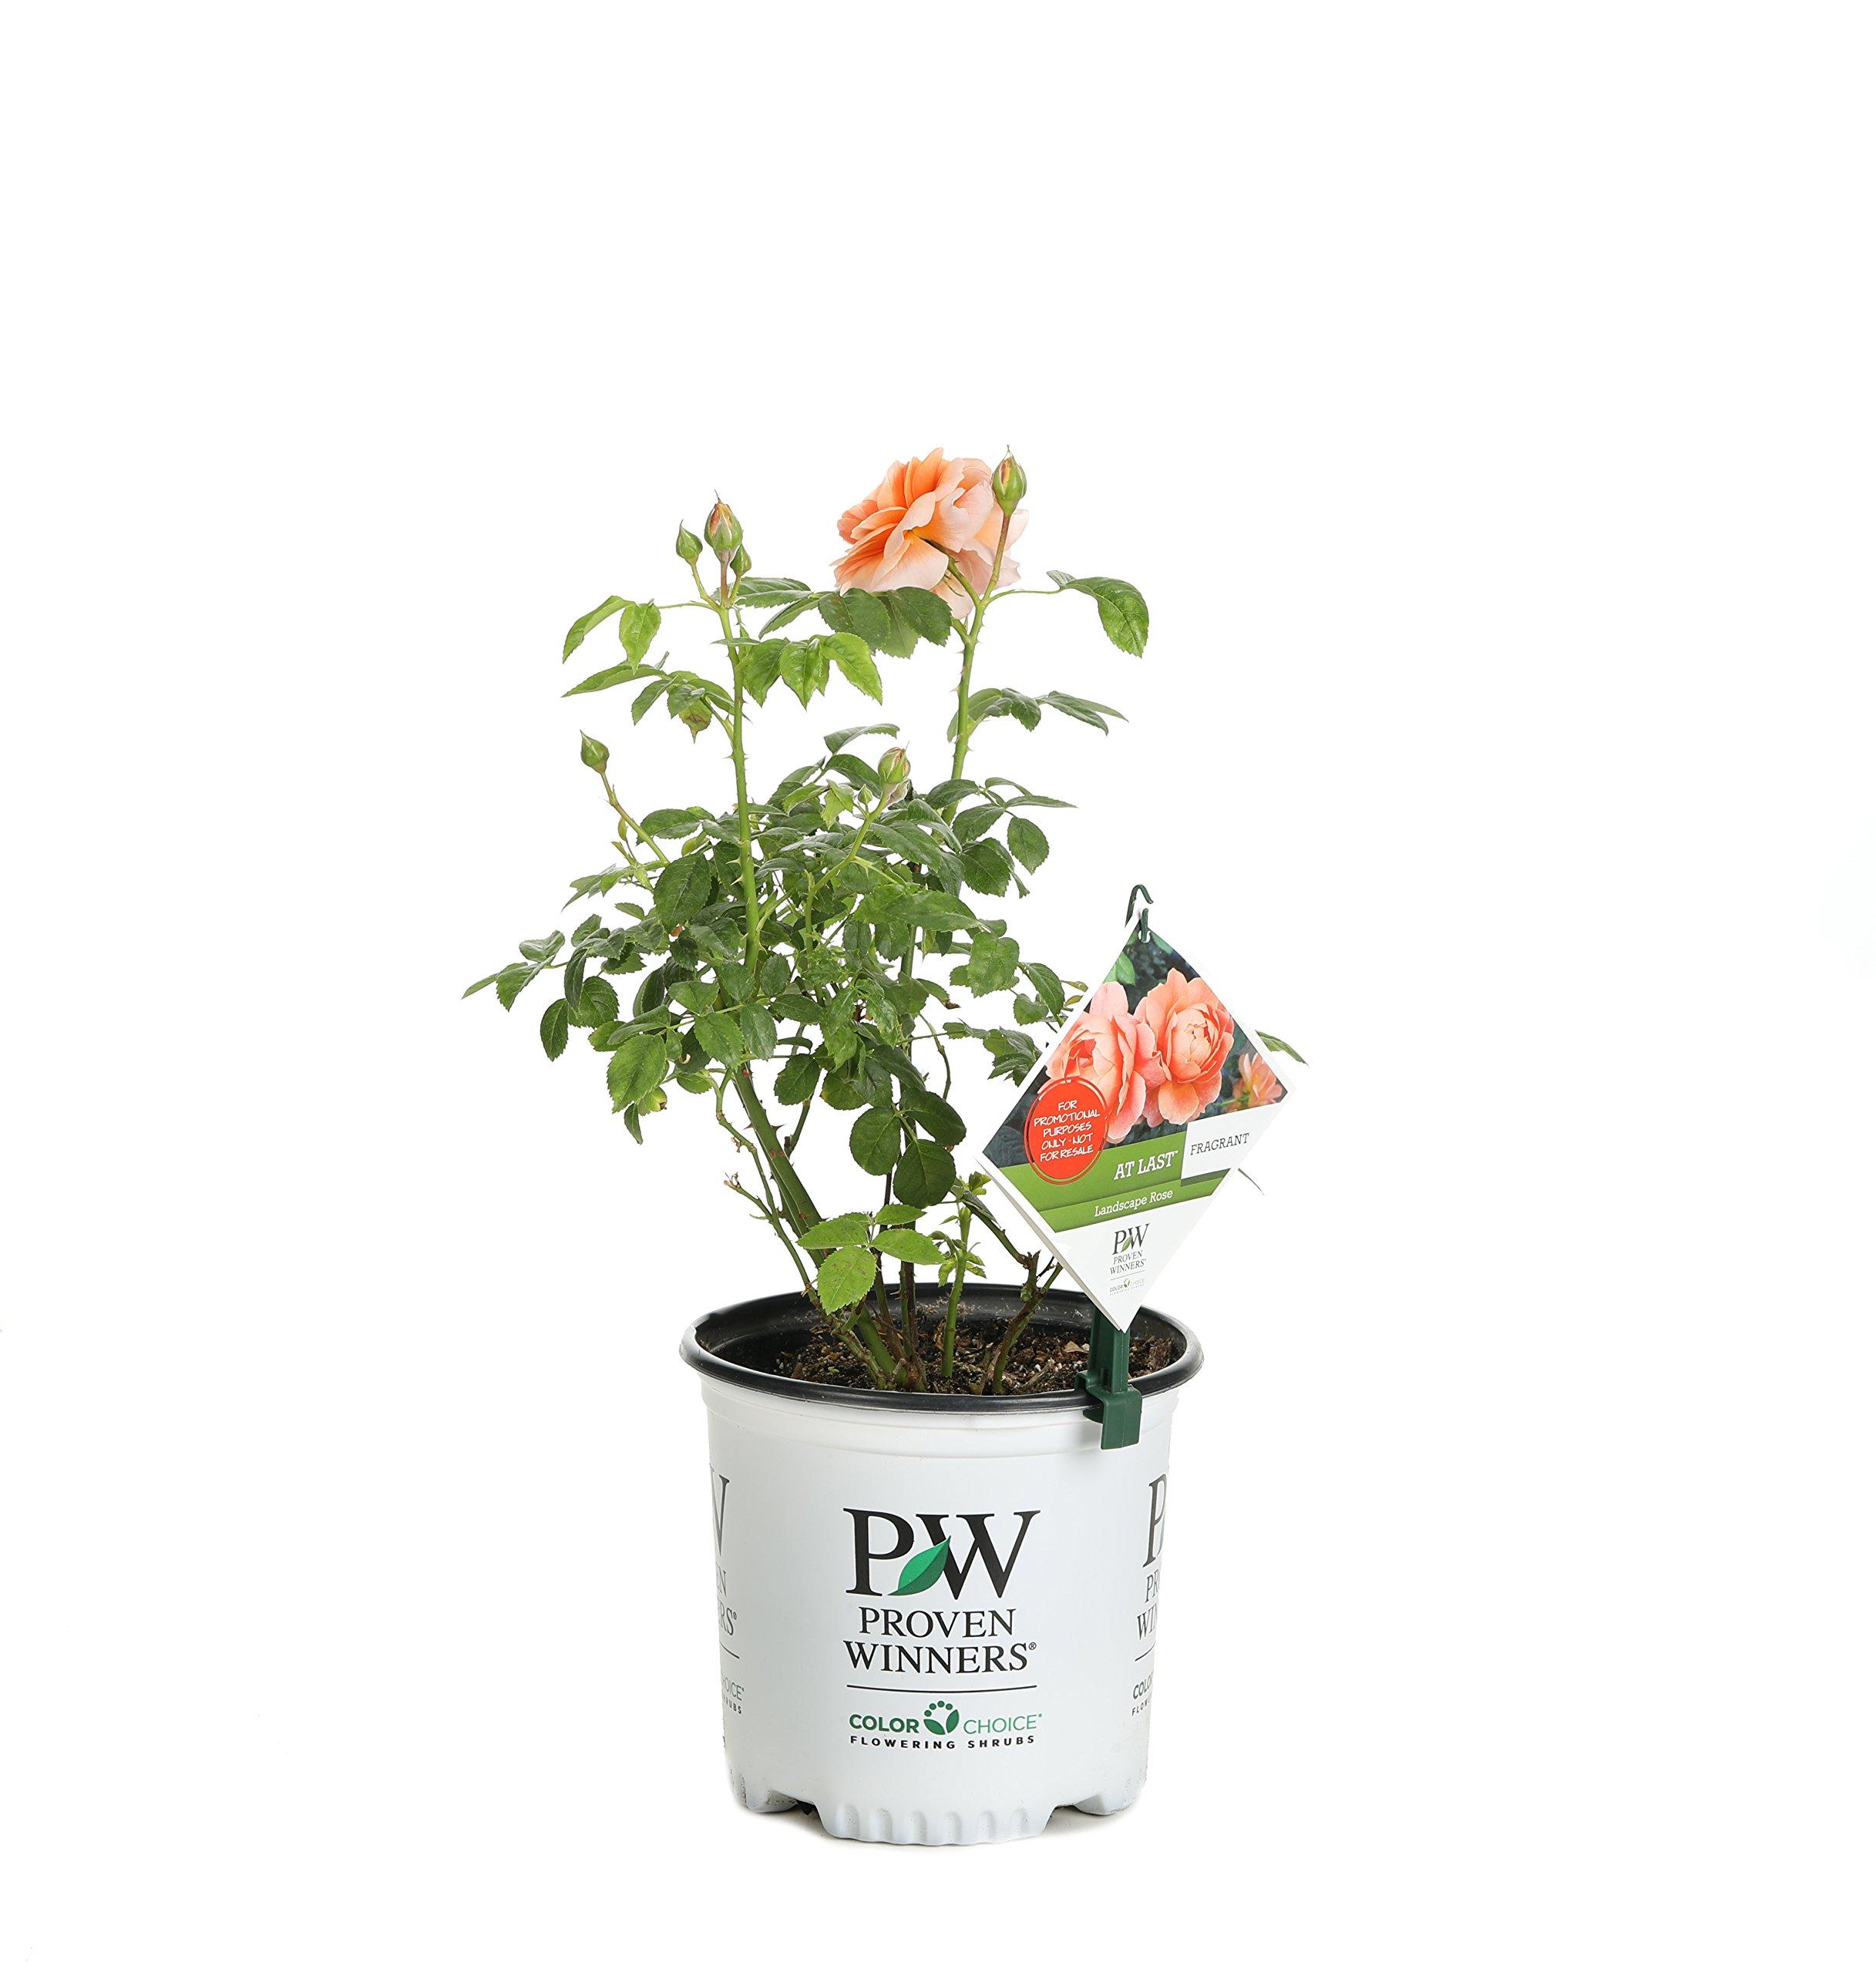 At Last Rose (Rosa) Live Shrub, Orange Flowers, 1 Gallon